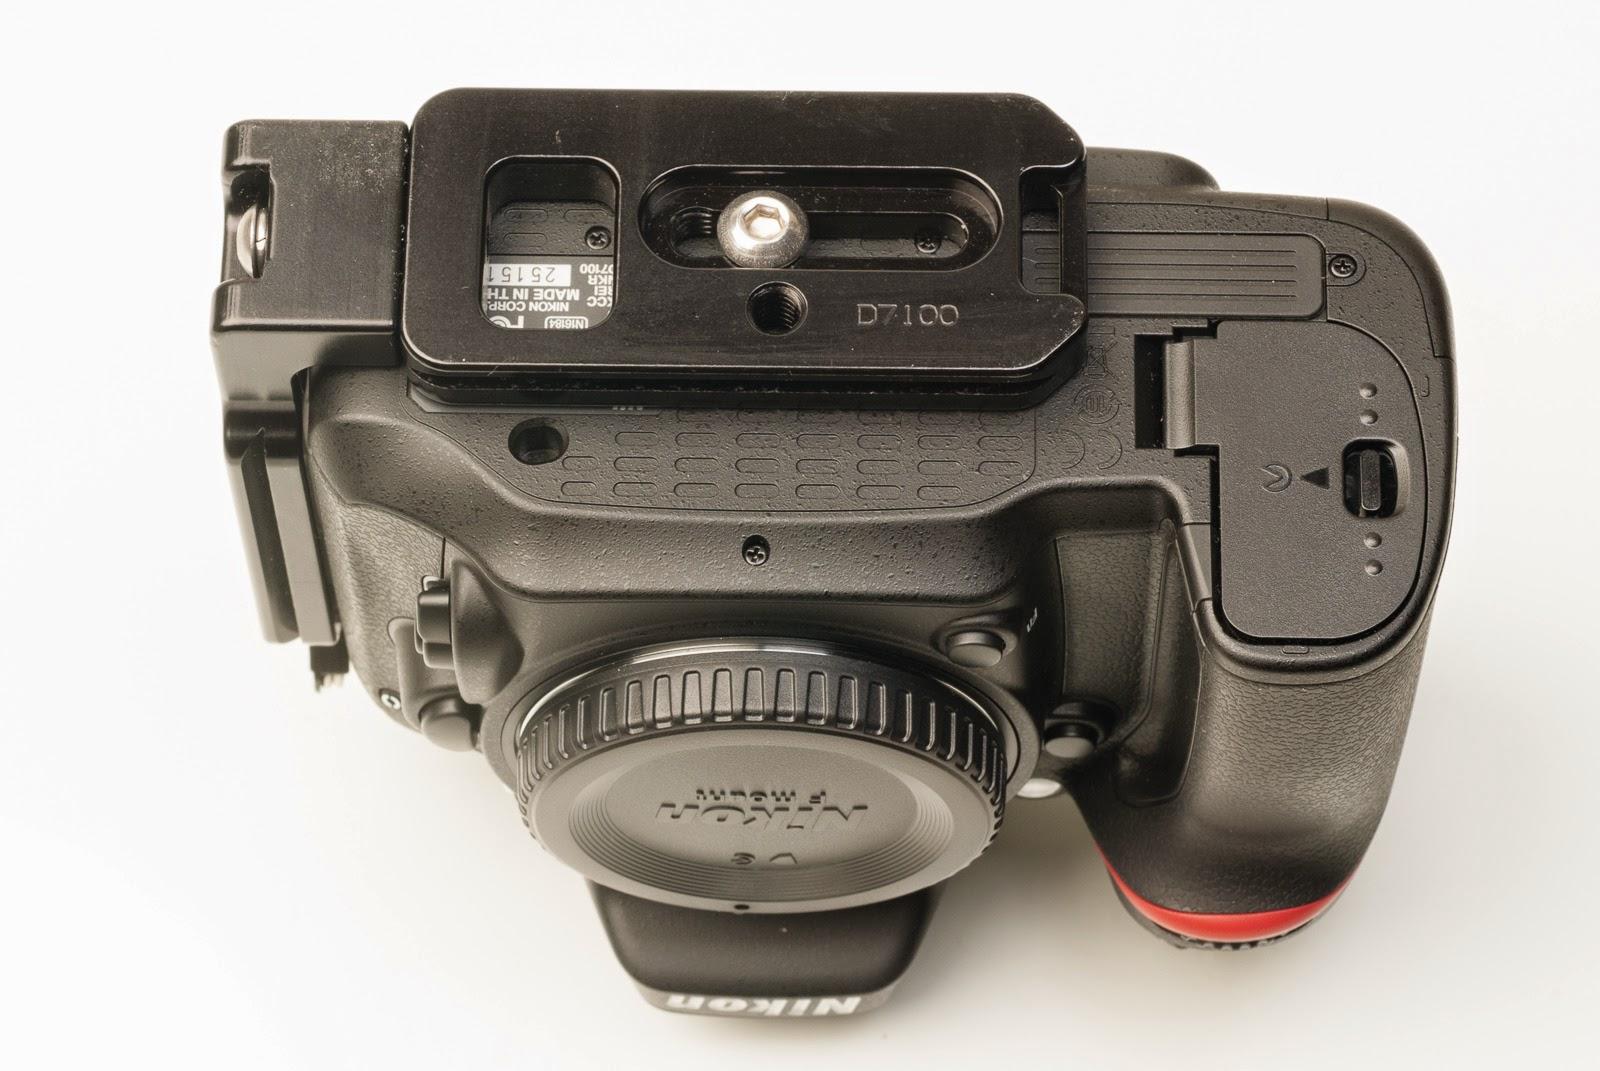 Nikon D7100 w/ ND-7100 L bracket - bottom